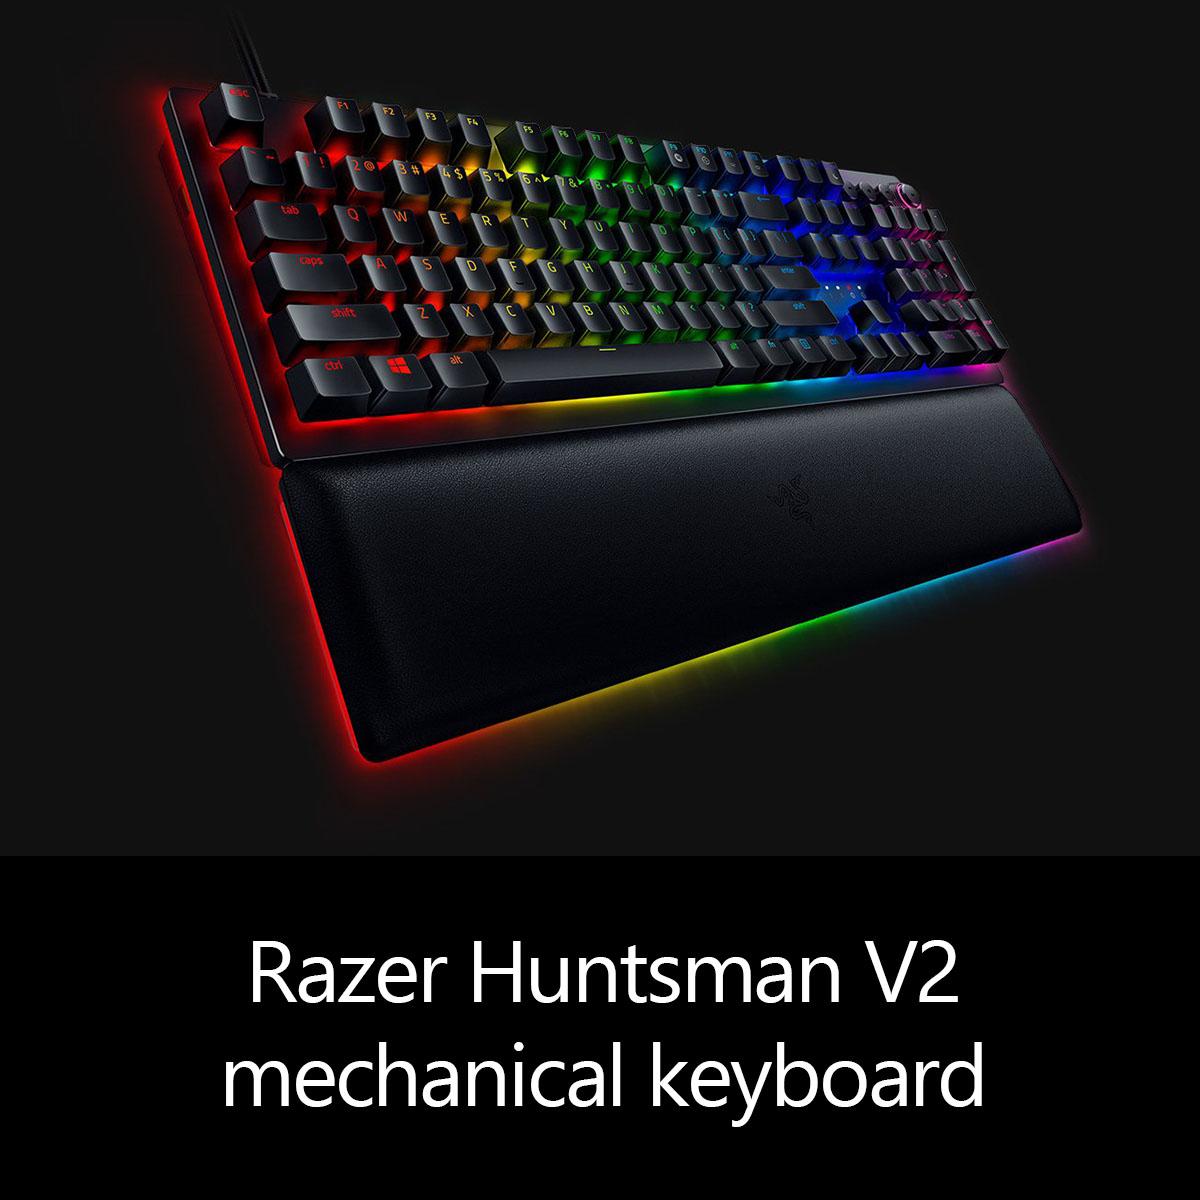 Razer Huntsman V2 mechanical keyboard